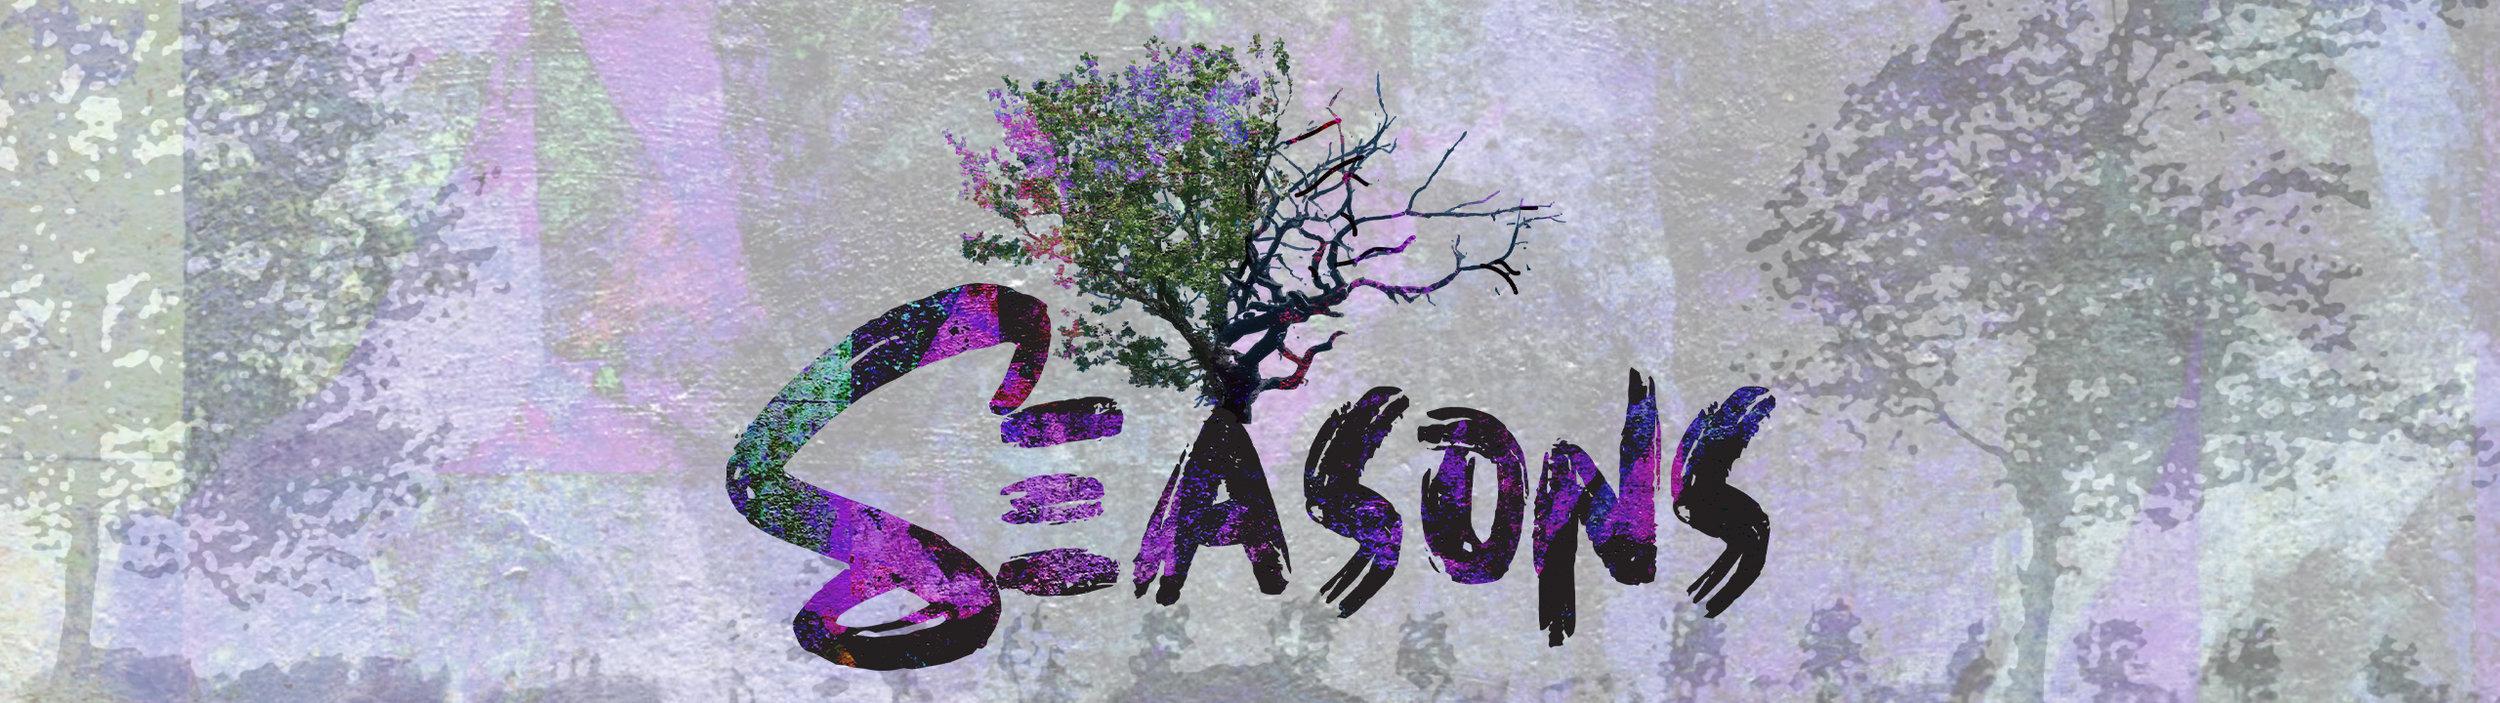 Seasonsbanner.jpg